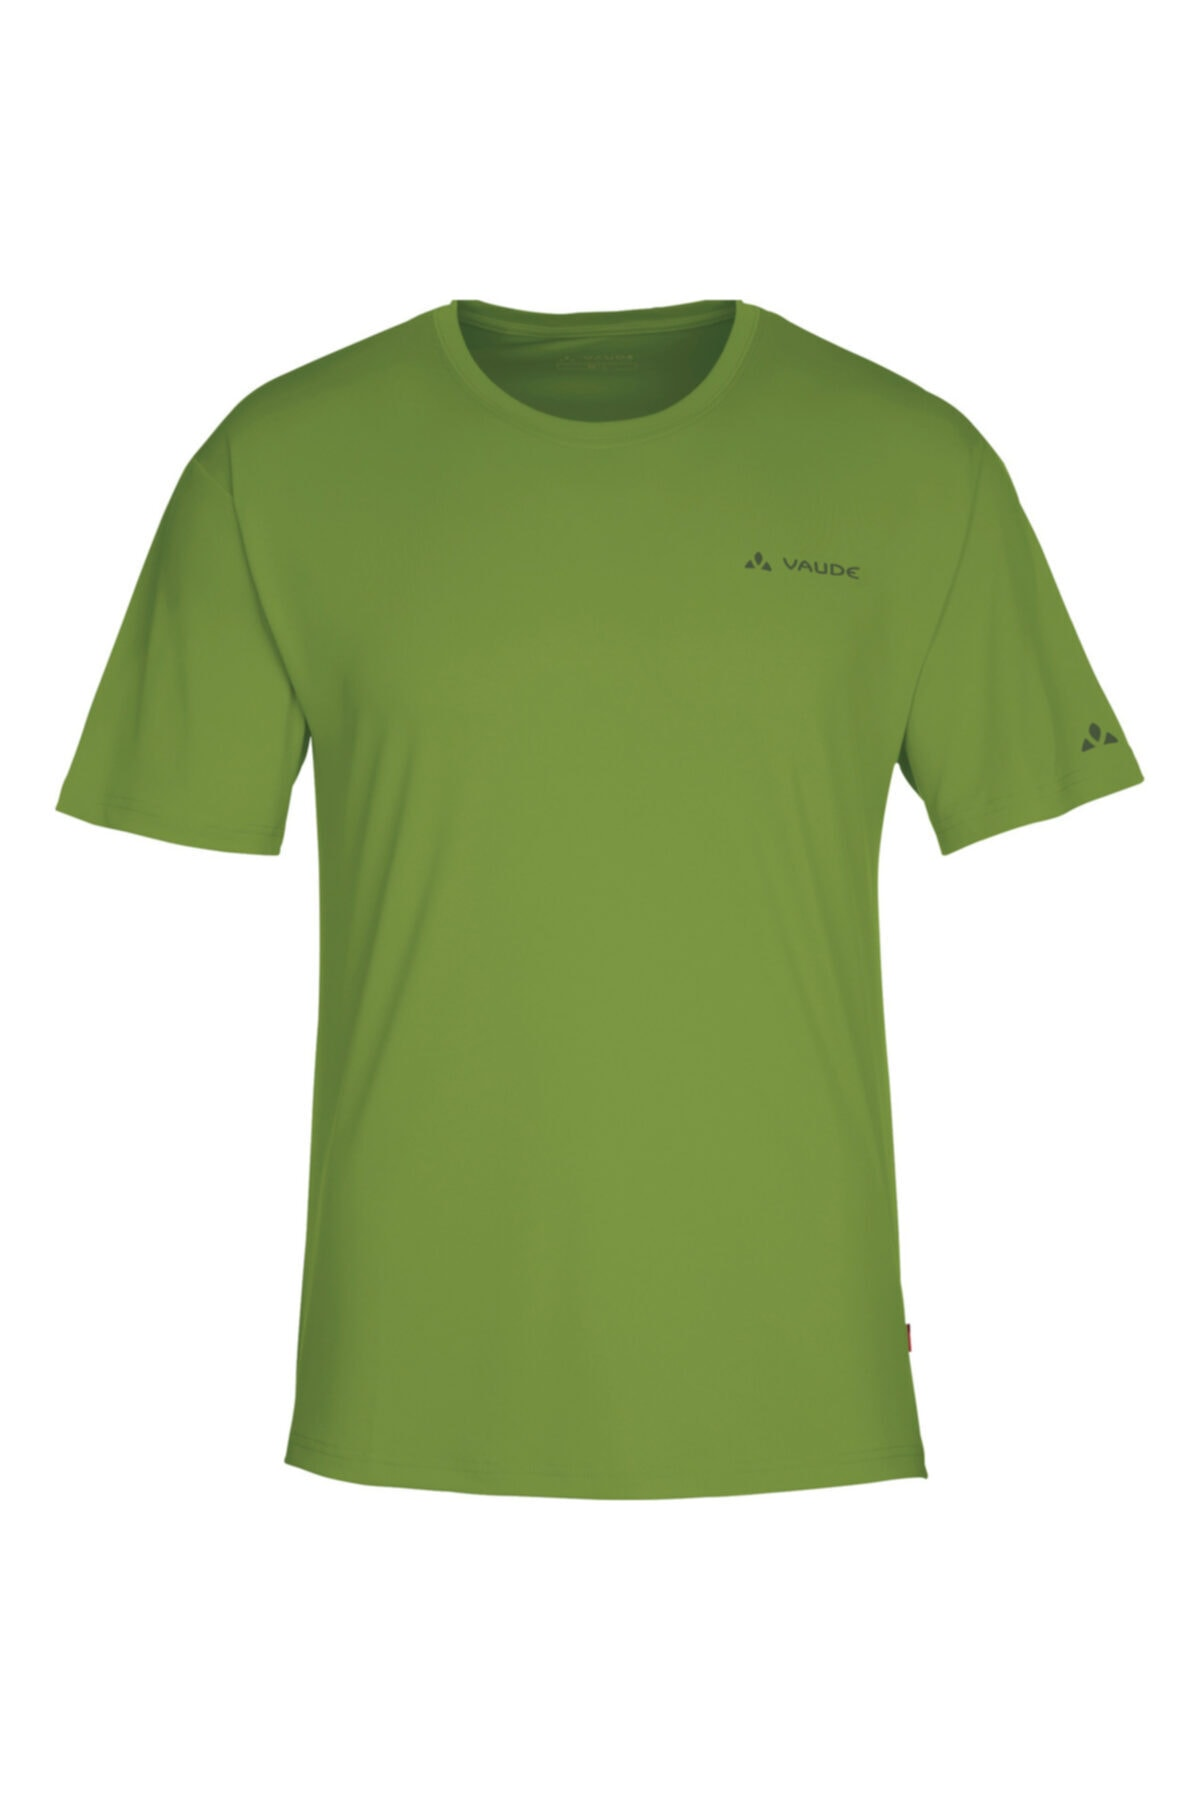 VAUDE Micro Big Fritz Iıı Erkek T-shirt 05061 1